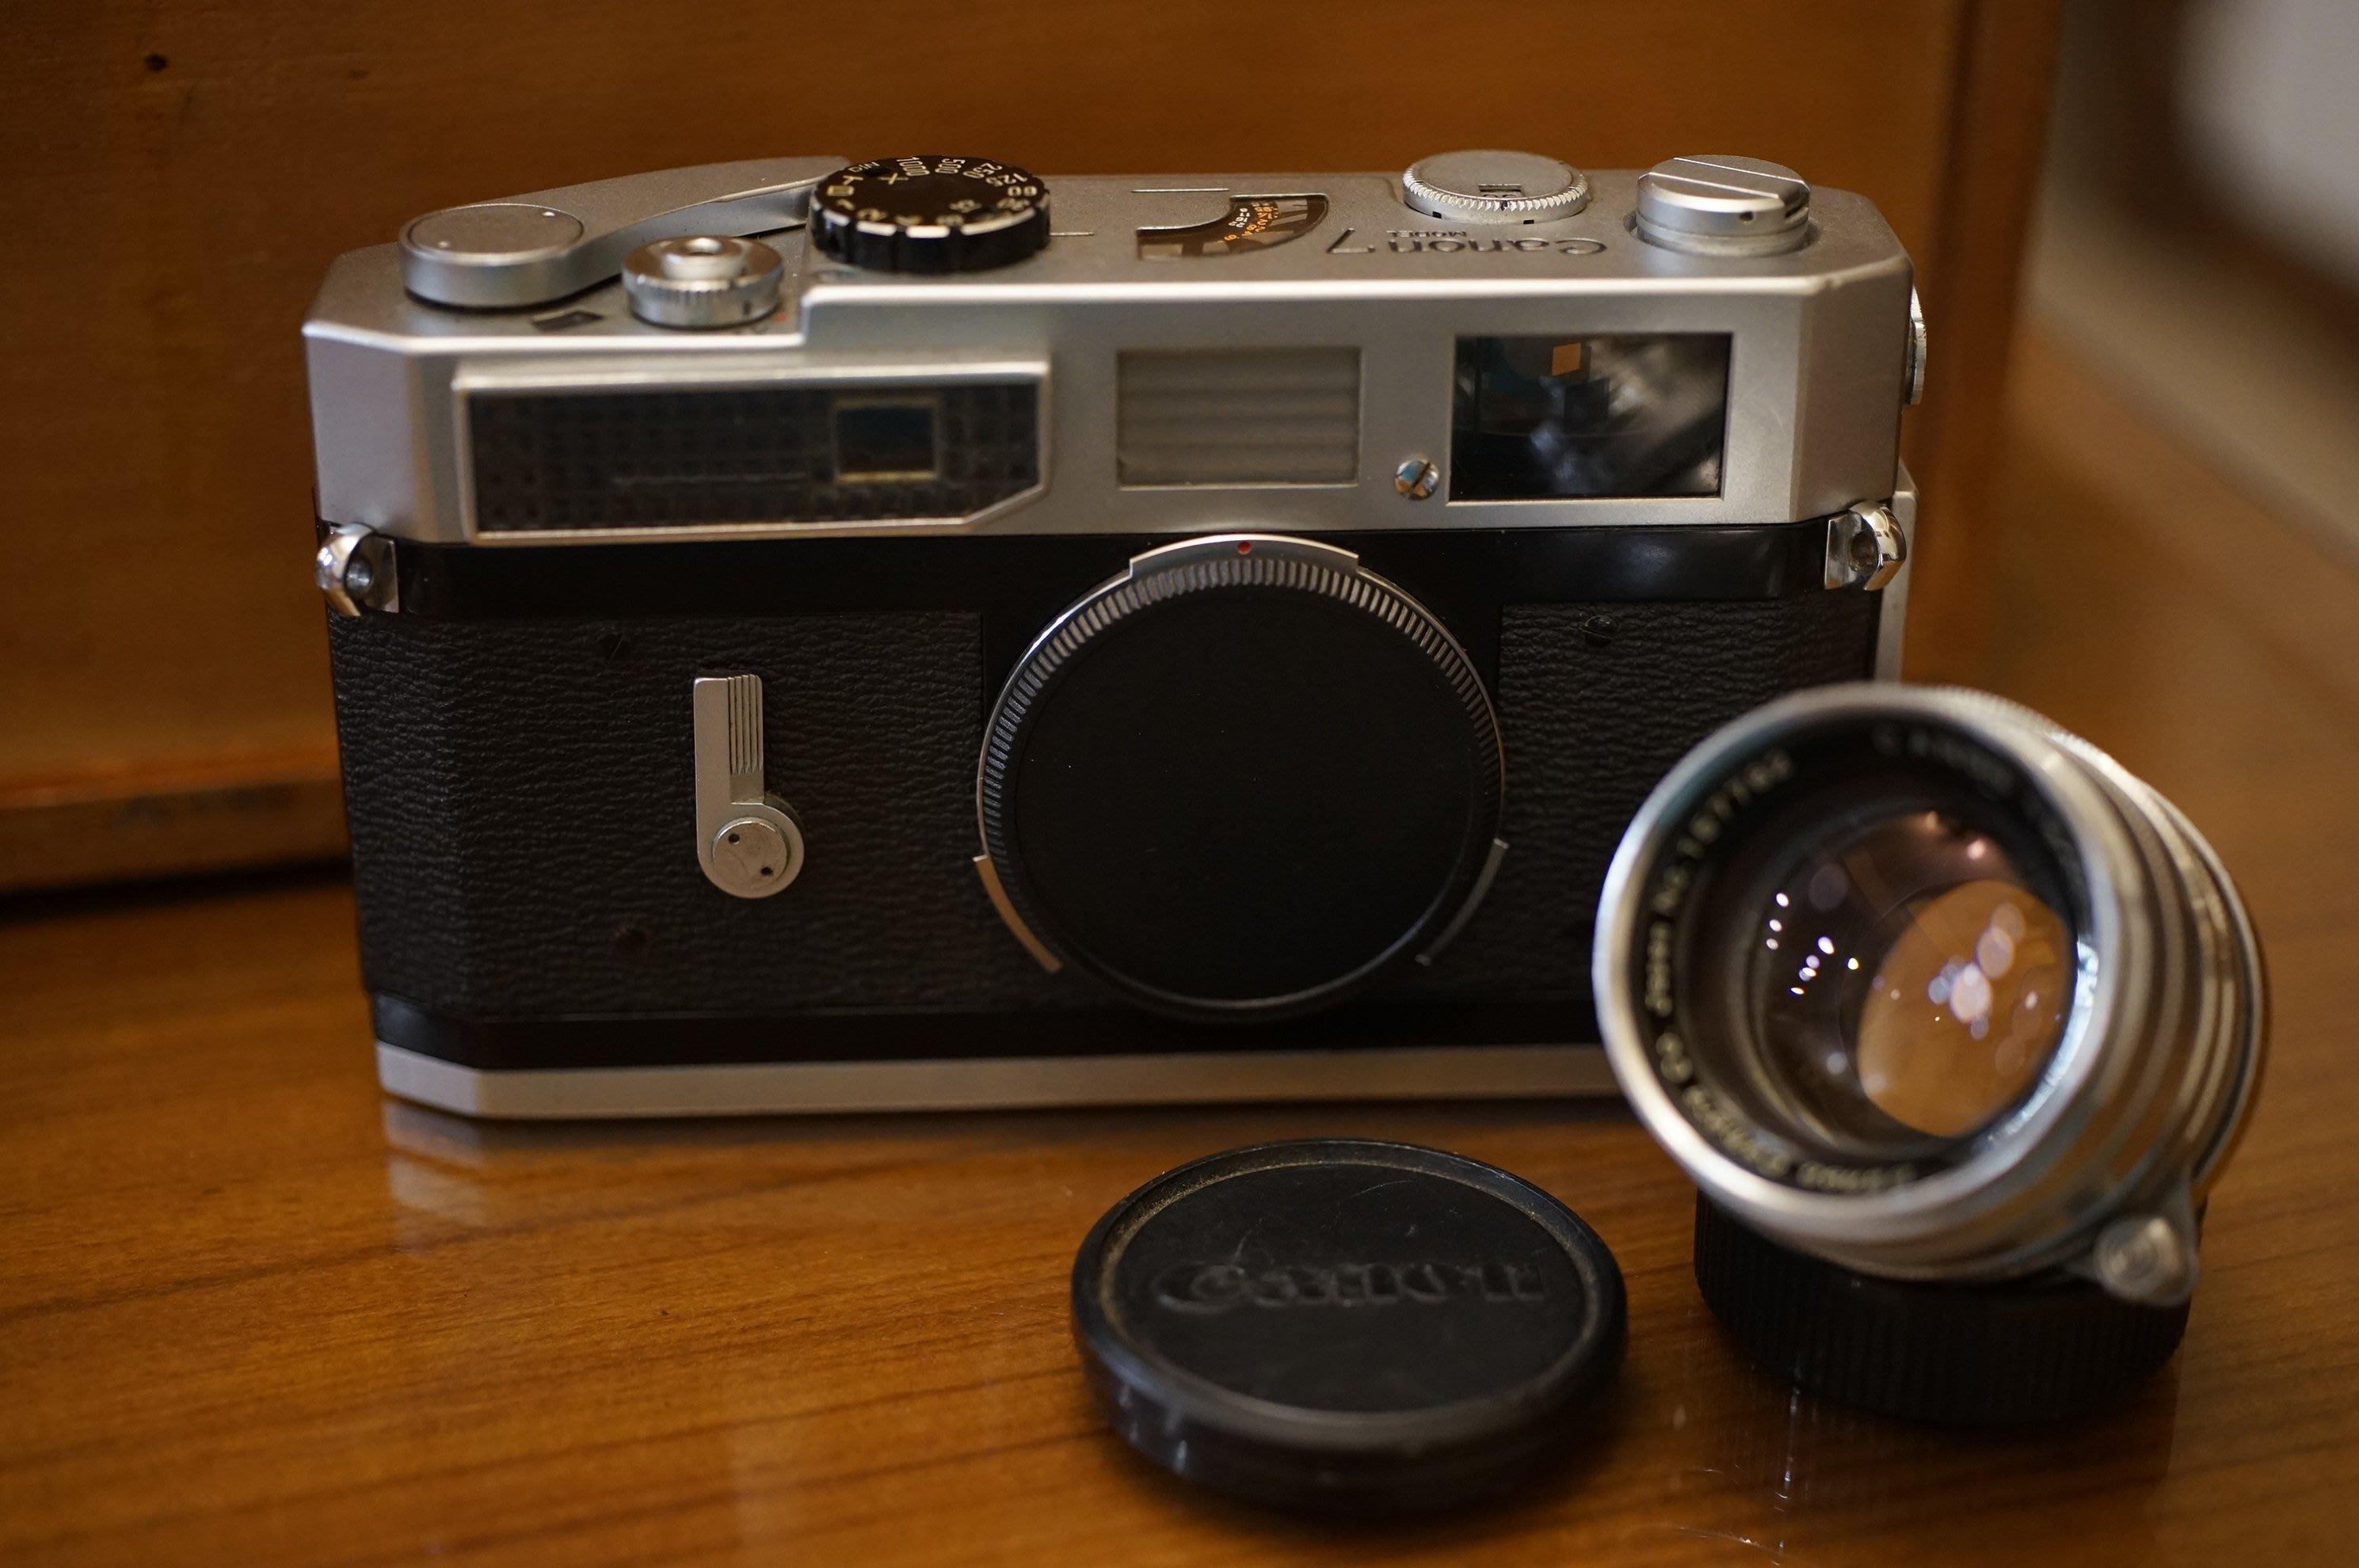 Canon 7 RF旁軸底片機加購 稀有超大光圈RF老鏡 L39 50mm F1.8 LTM